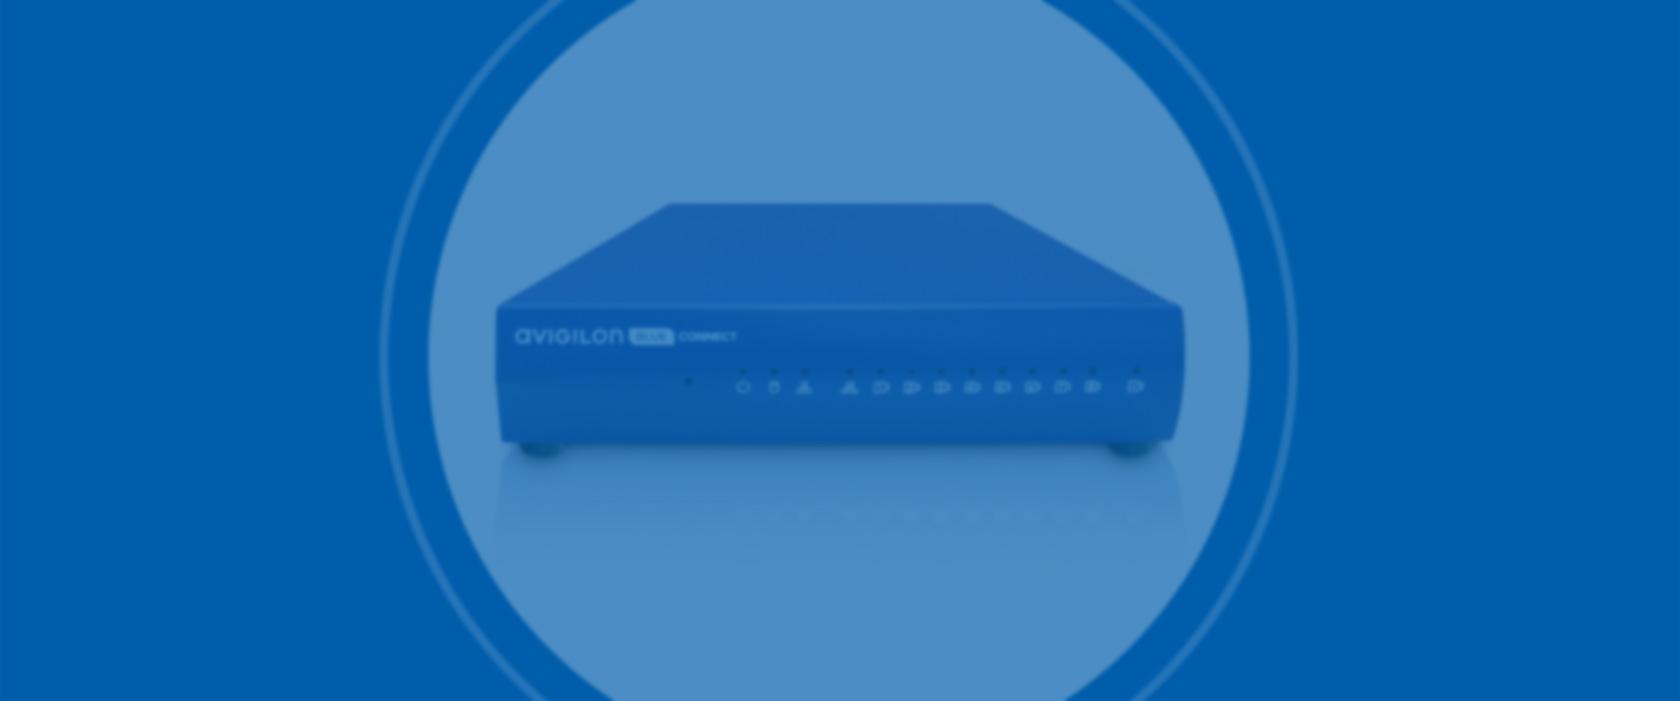 Avigilon Blue » Avigilon Blue Connect Device.